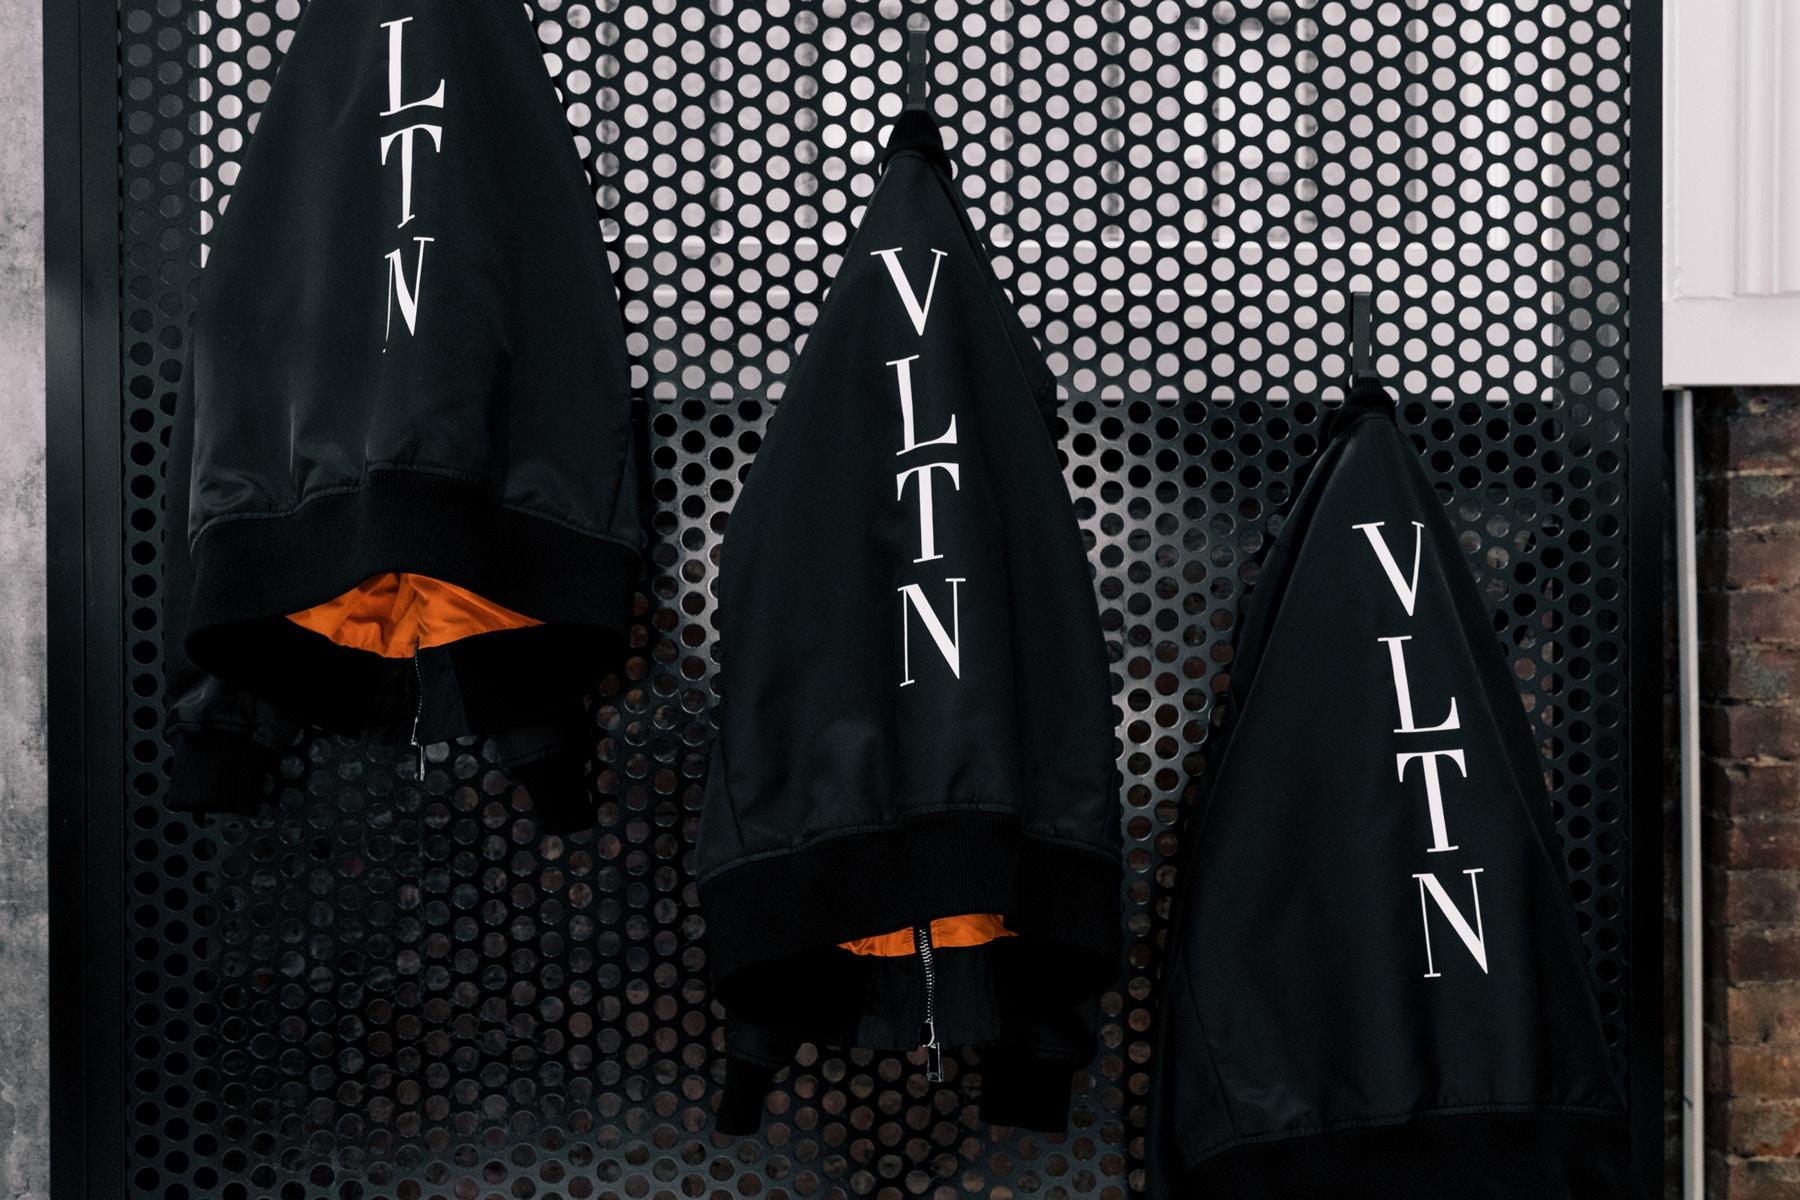 valentino-vltn-new-york-pop-up-mens-collection-28.jpg